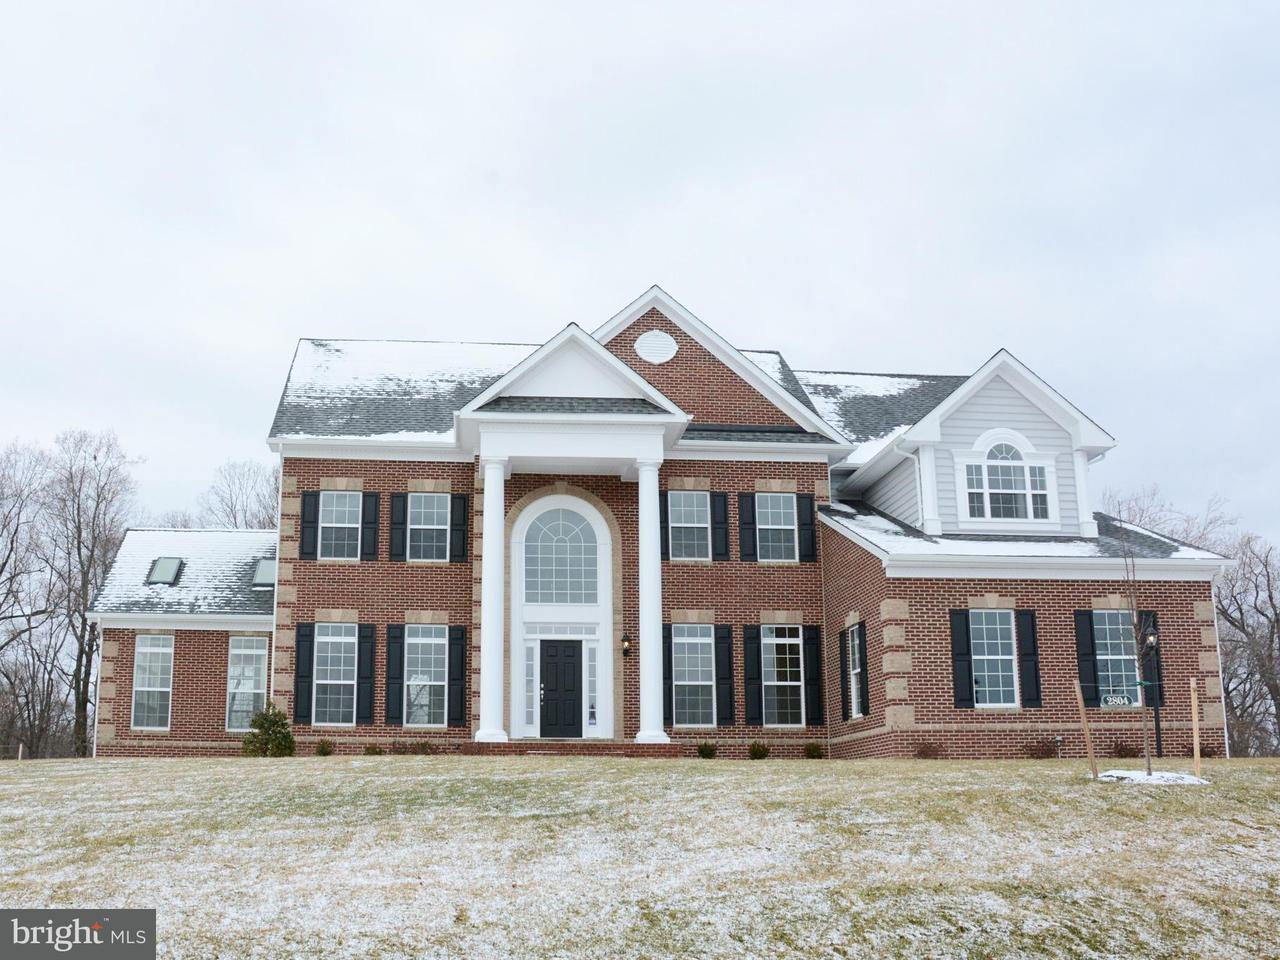 Single Family Home for Sale at 15502 High Ridge Court 15502 High Ridge Court Aquasco, Maryland 20608 United States